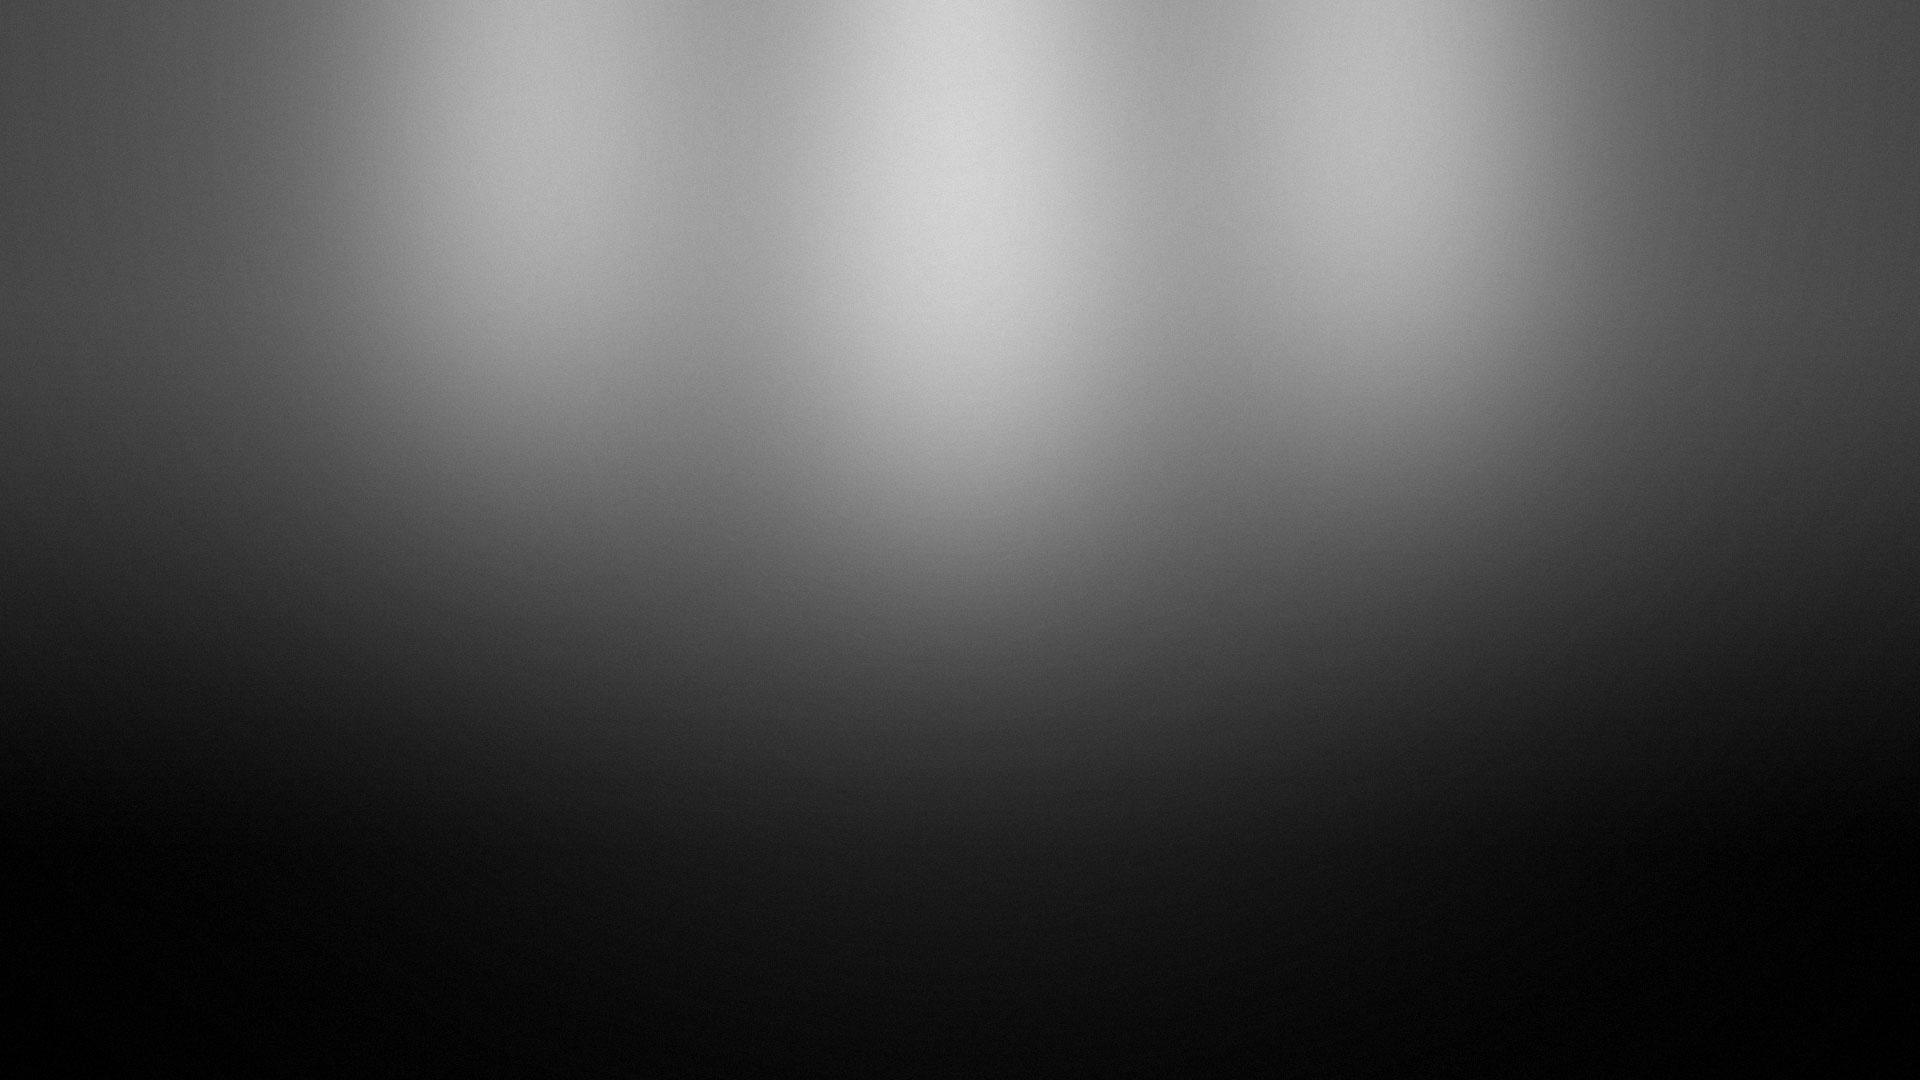 background web images 1920x1080 1920x1080